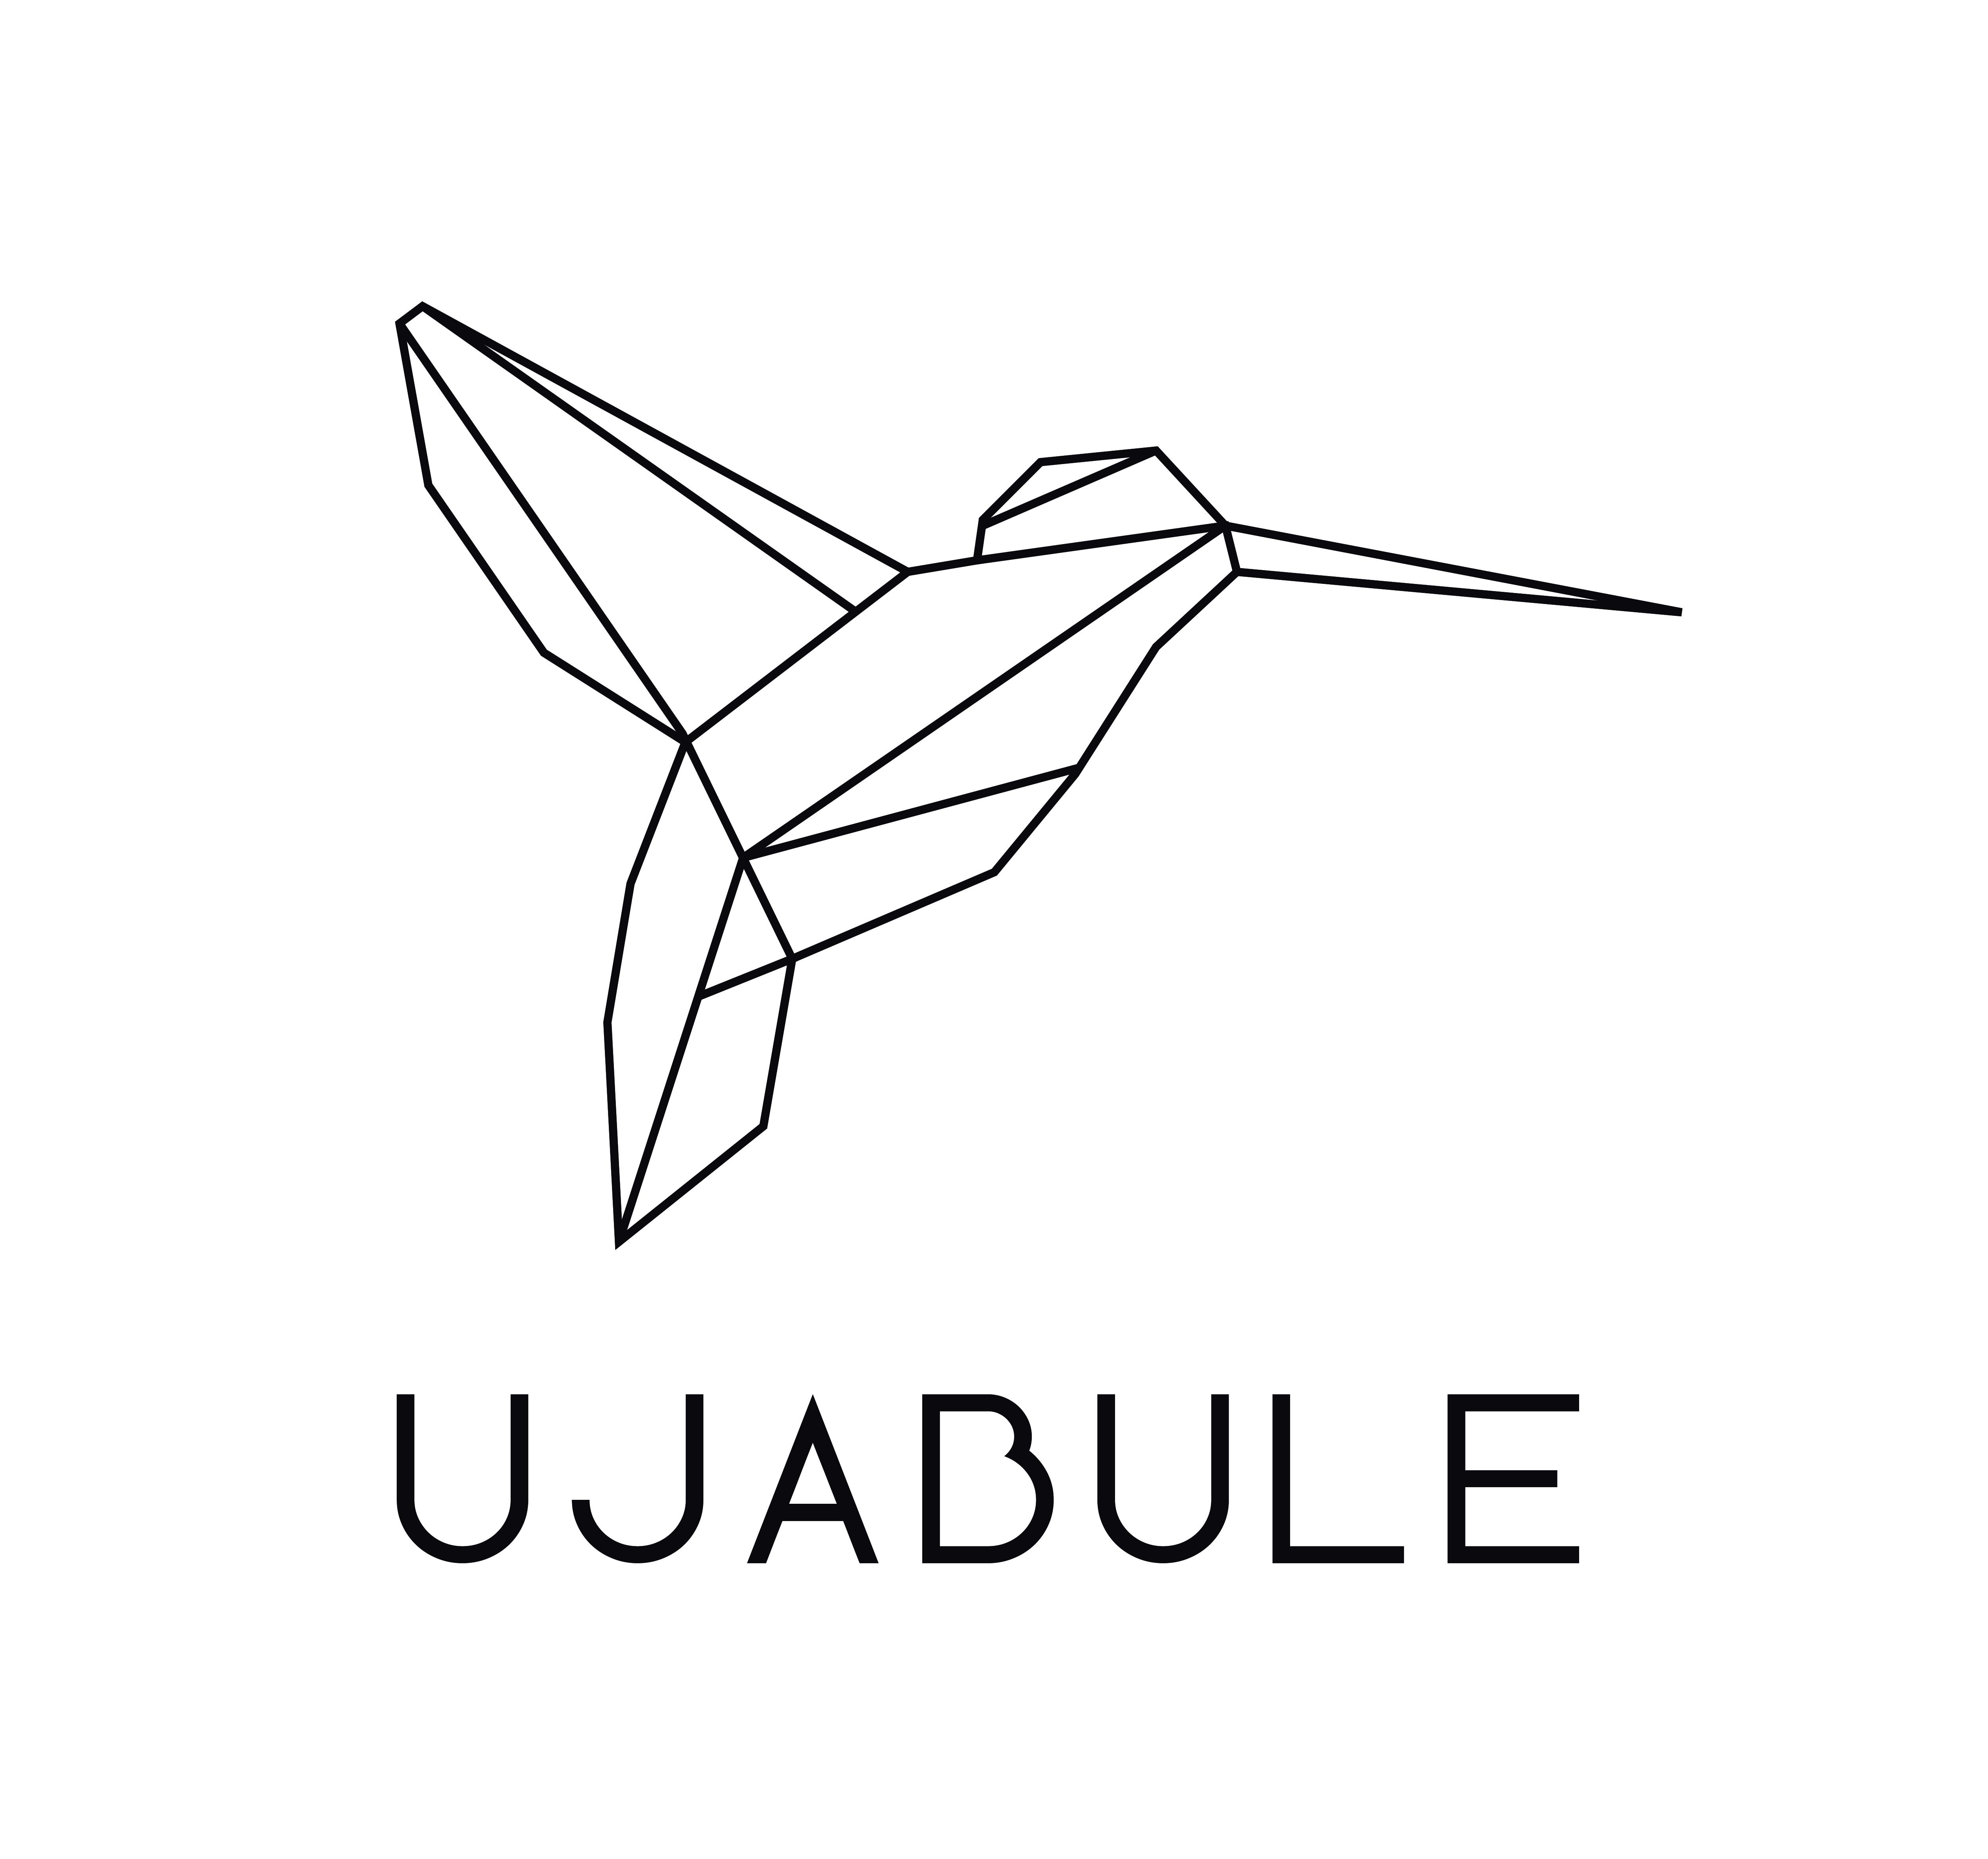 Ujabule